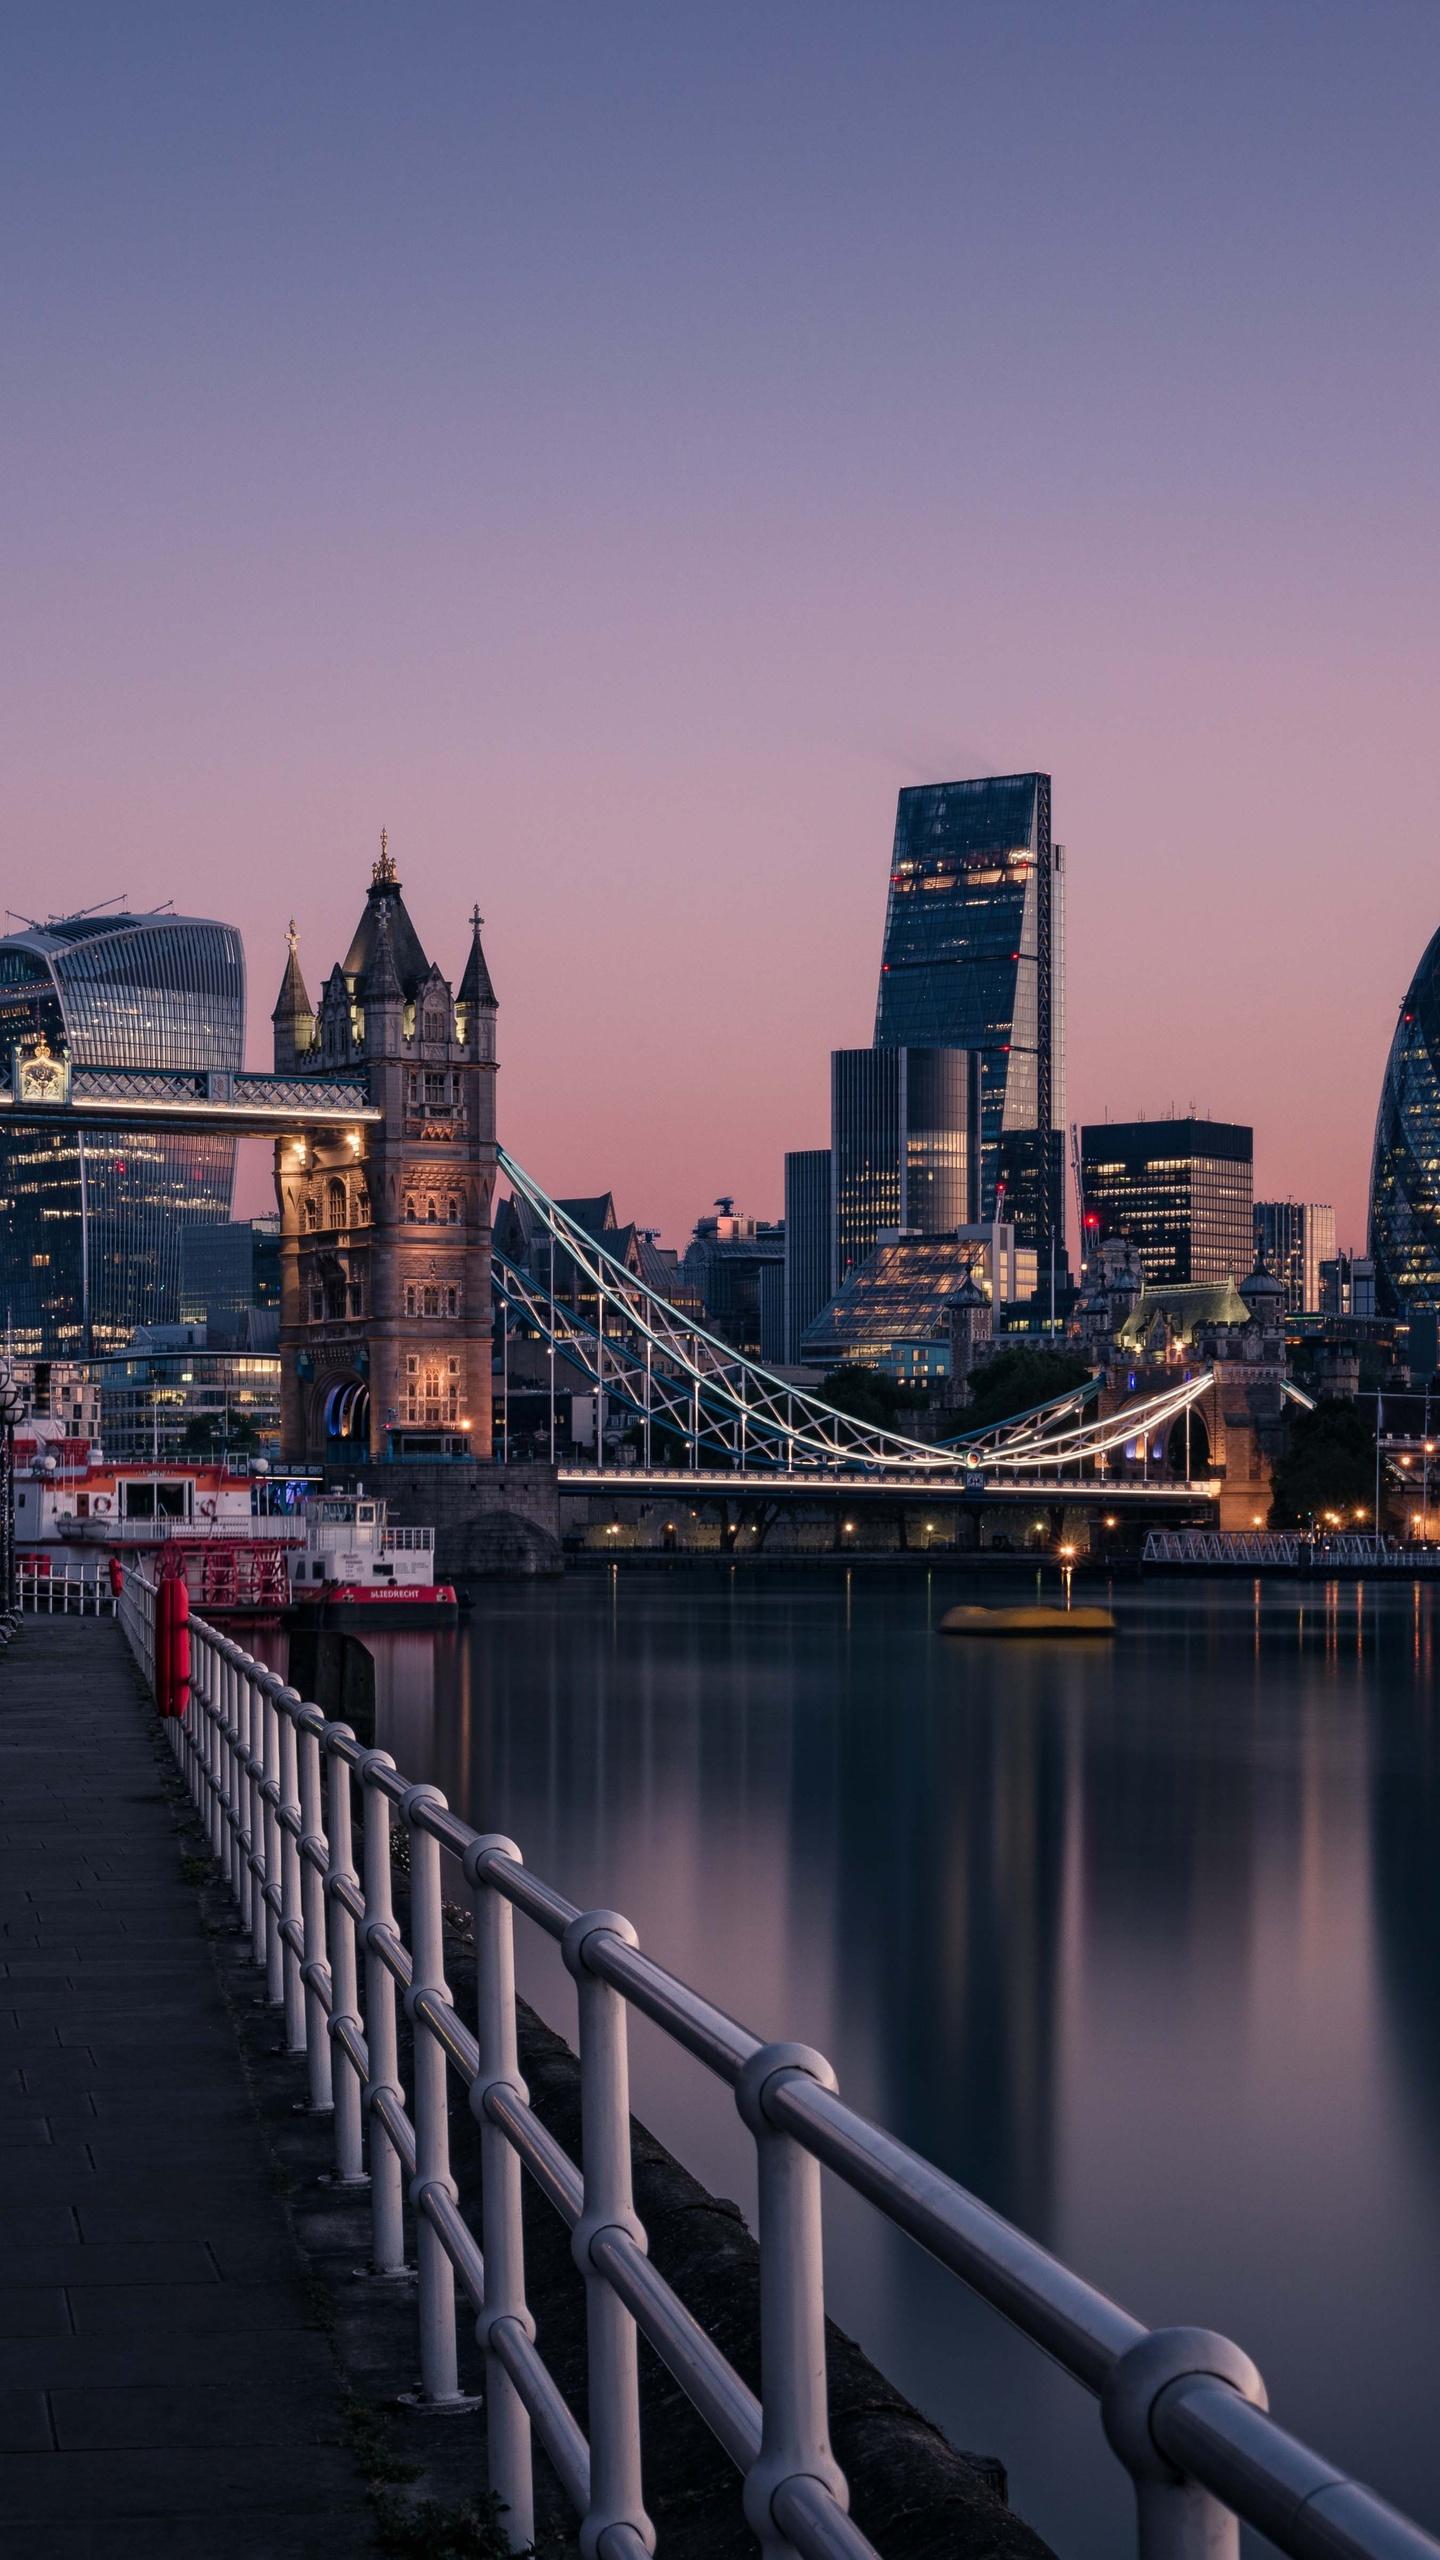 1440x2560 london england tower bridge thames river cityscape urban